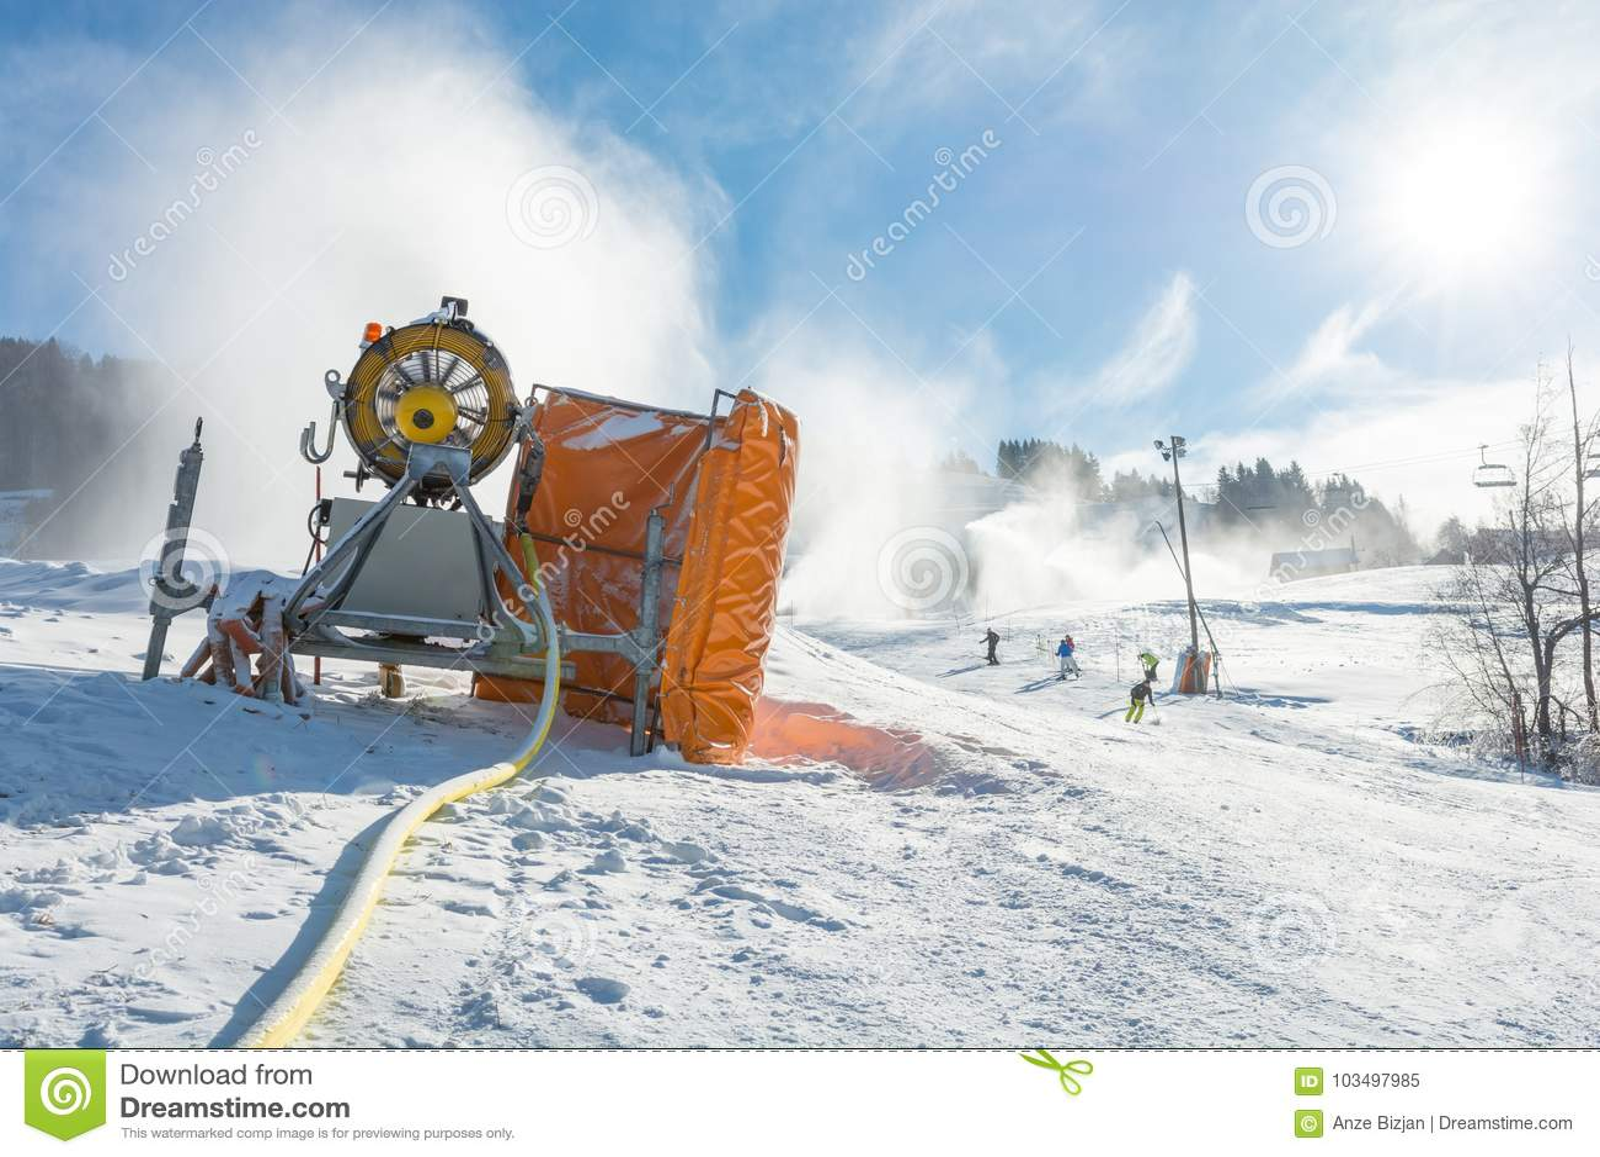 ski resort with snow gun making new surface. stock image - image of